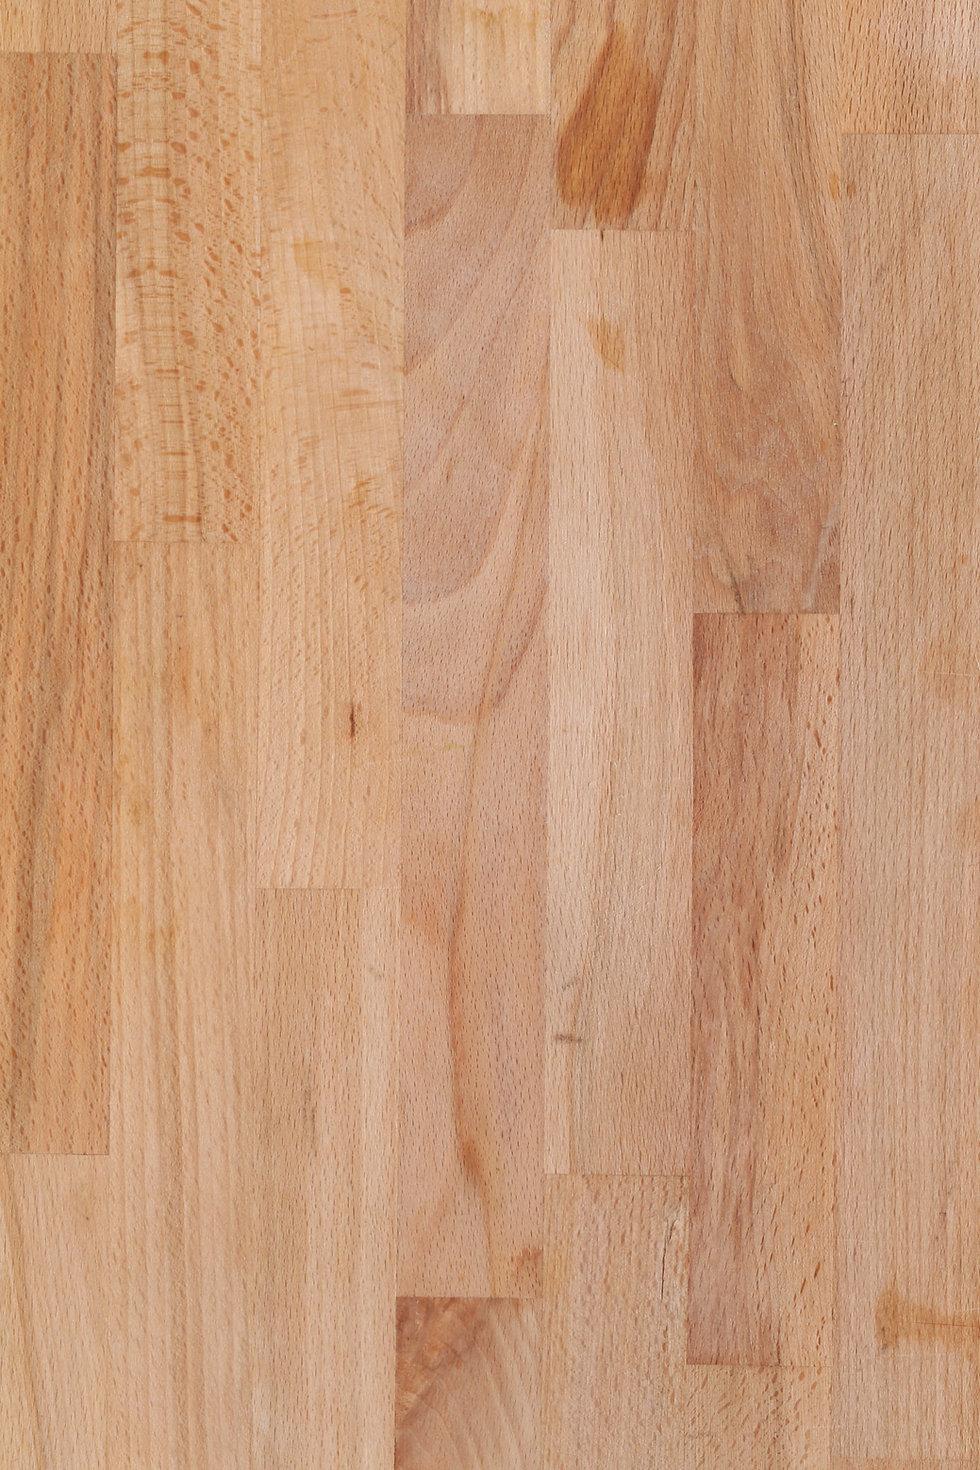 Wooden%20Board_edited.jpg